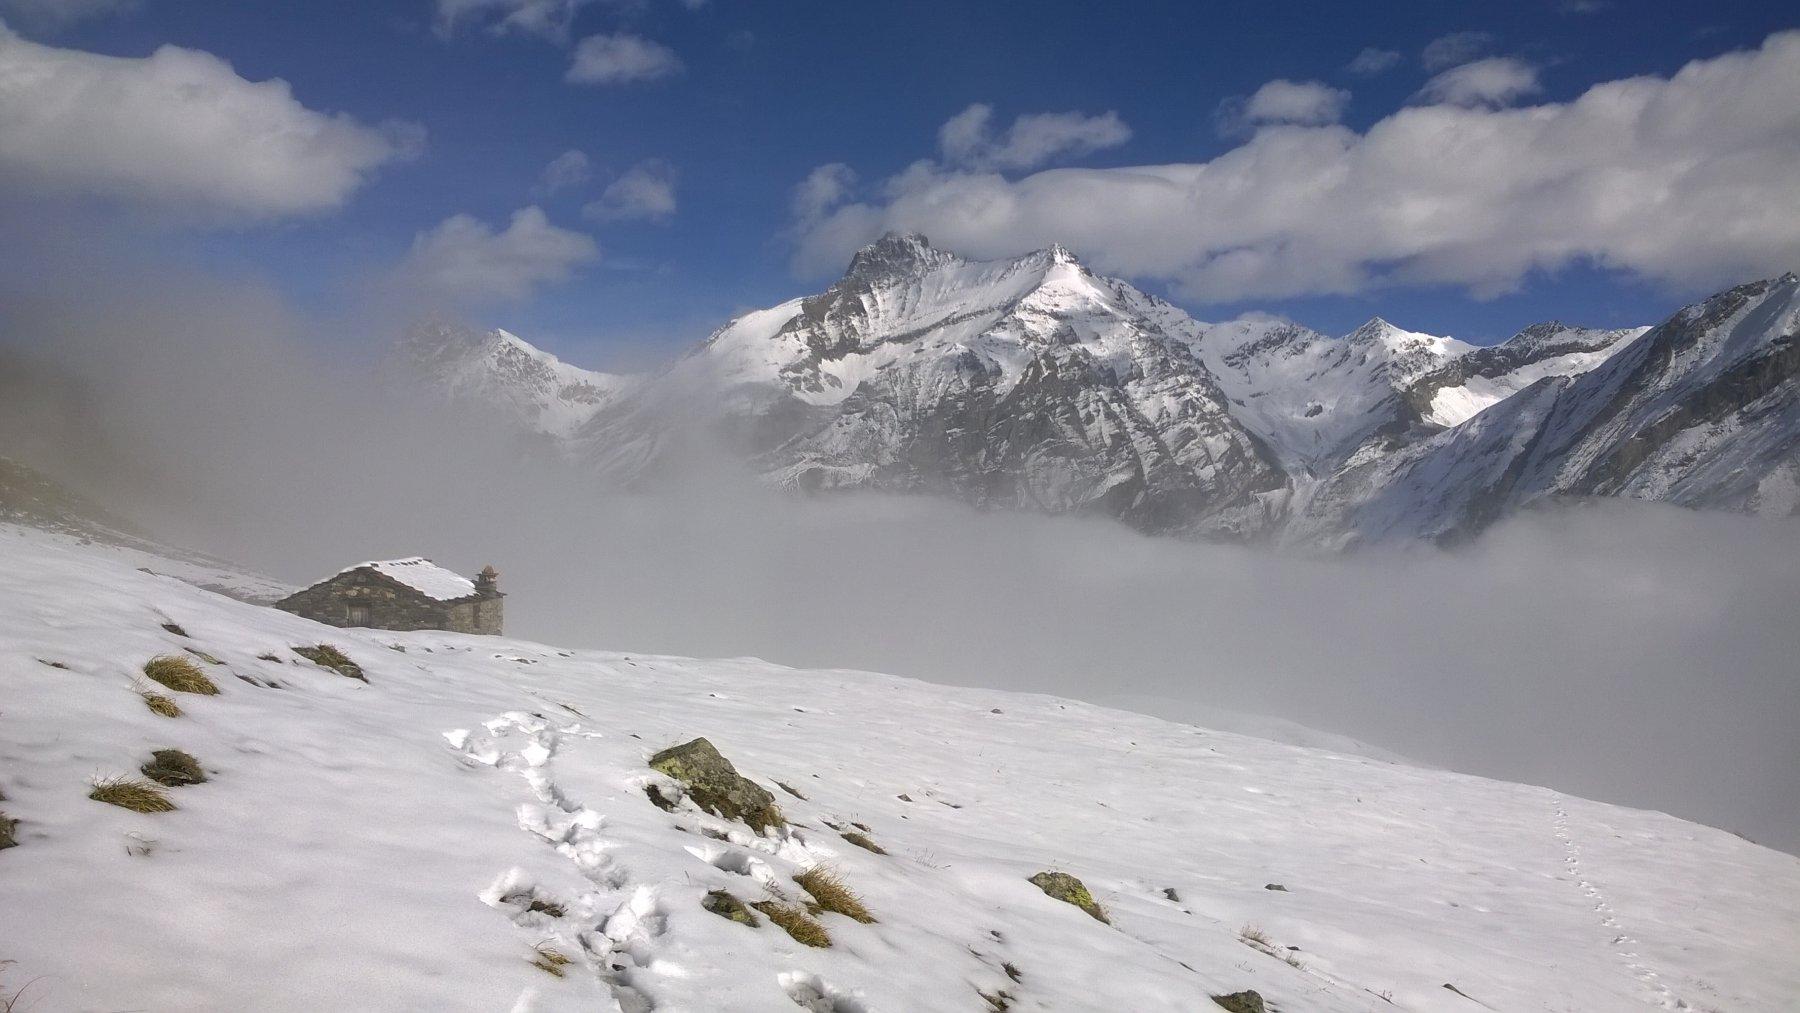 L'alpe dei laghi